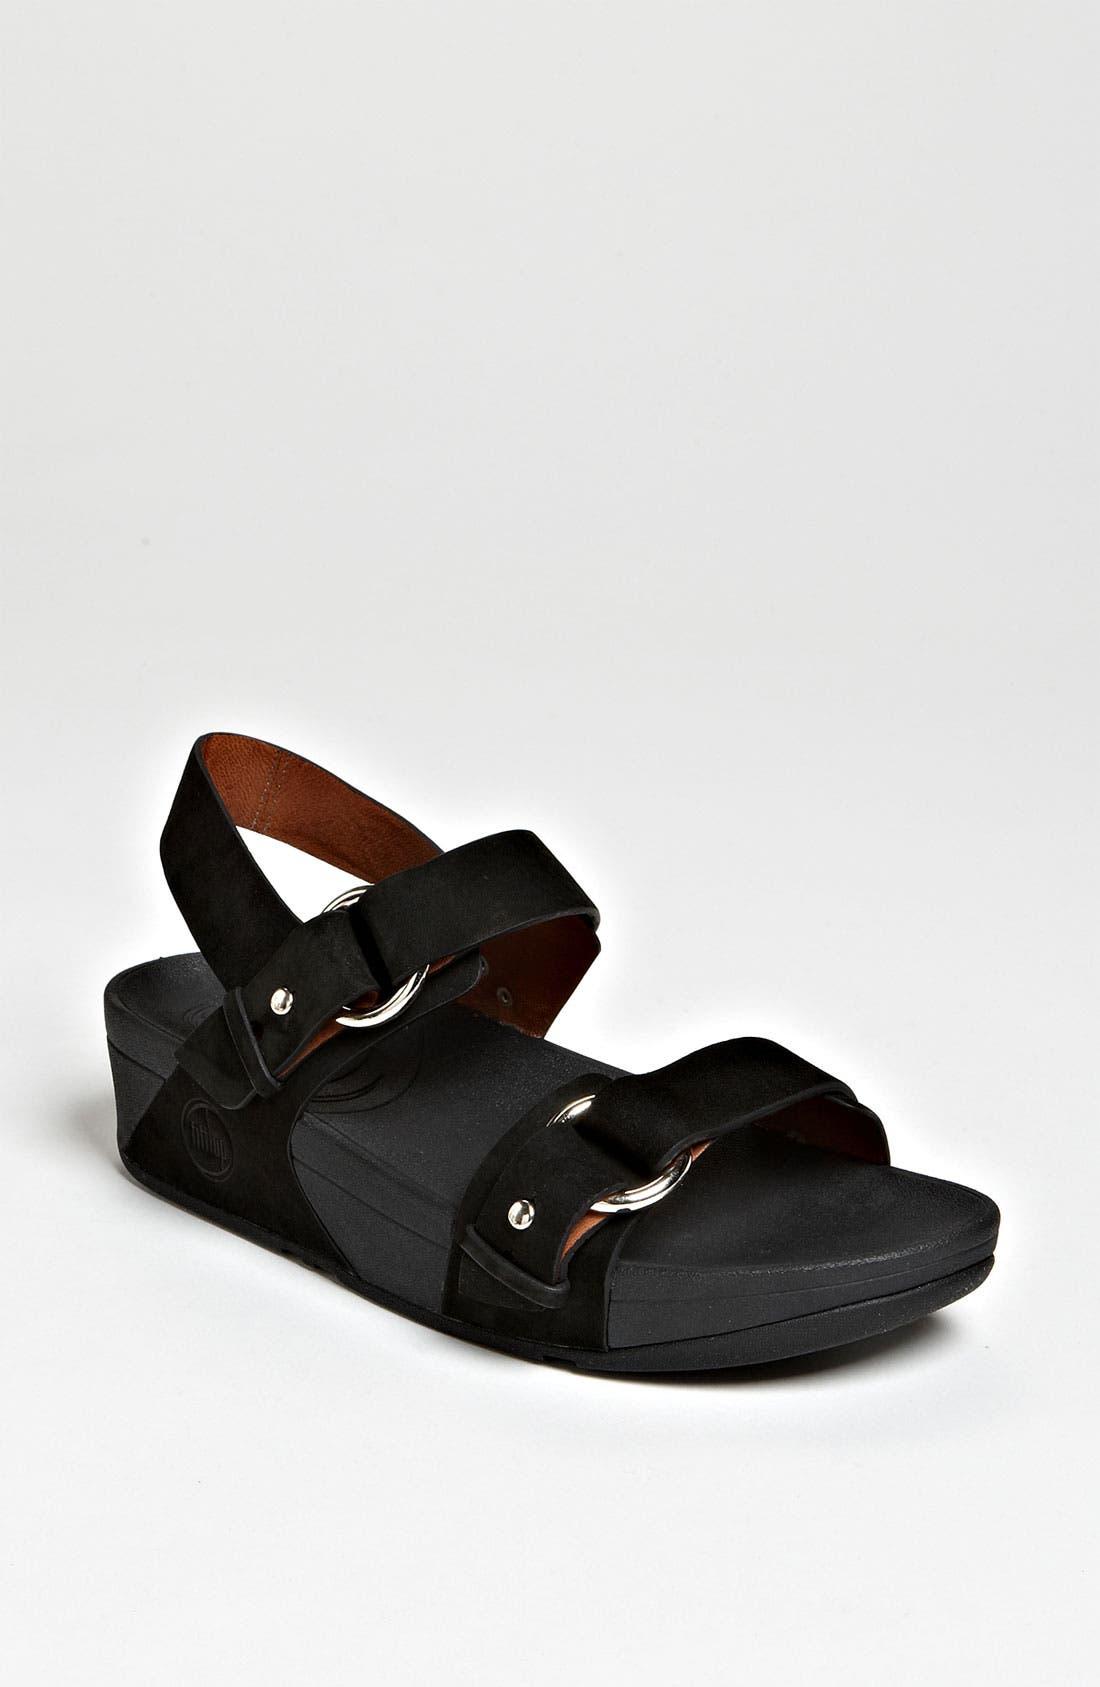 Main Image - FitFlop 'Via™ Bar' Sandal